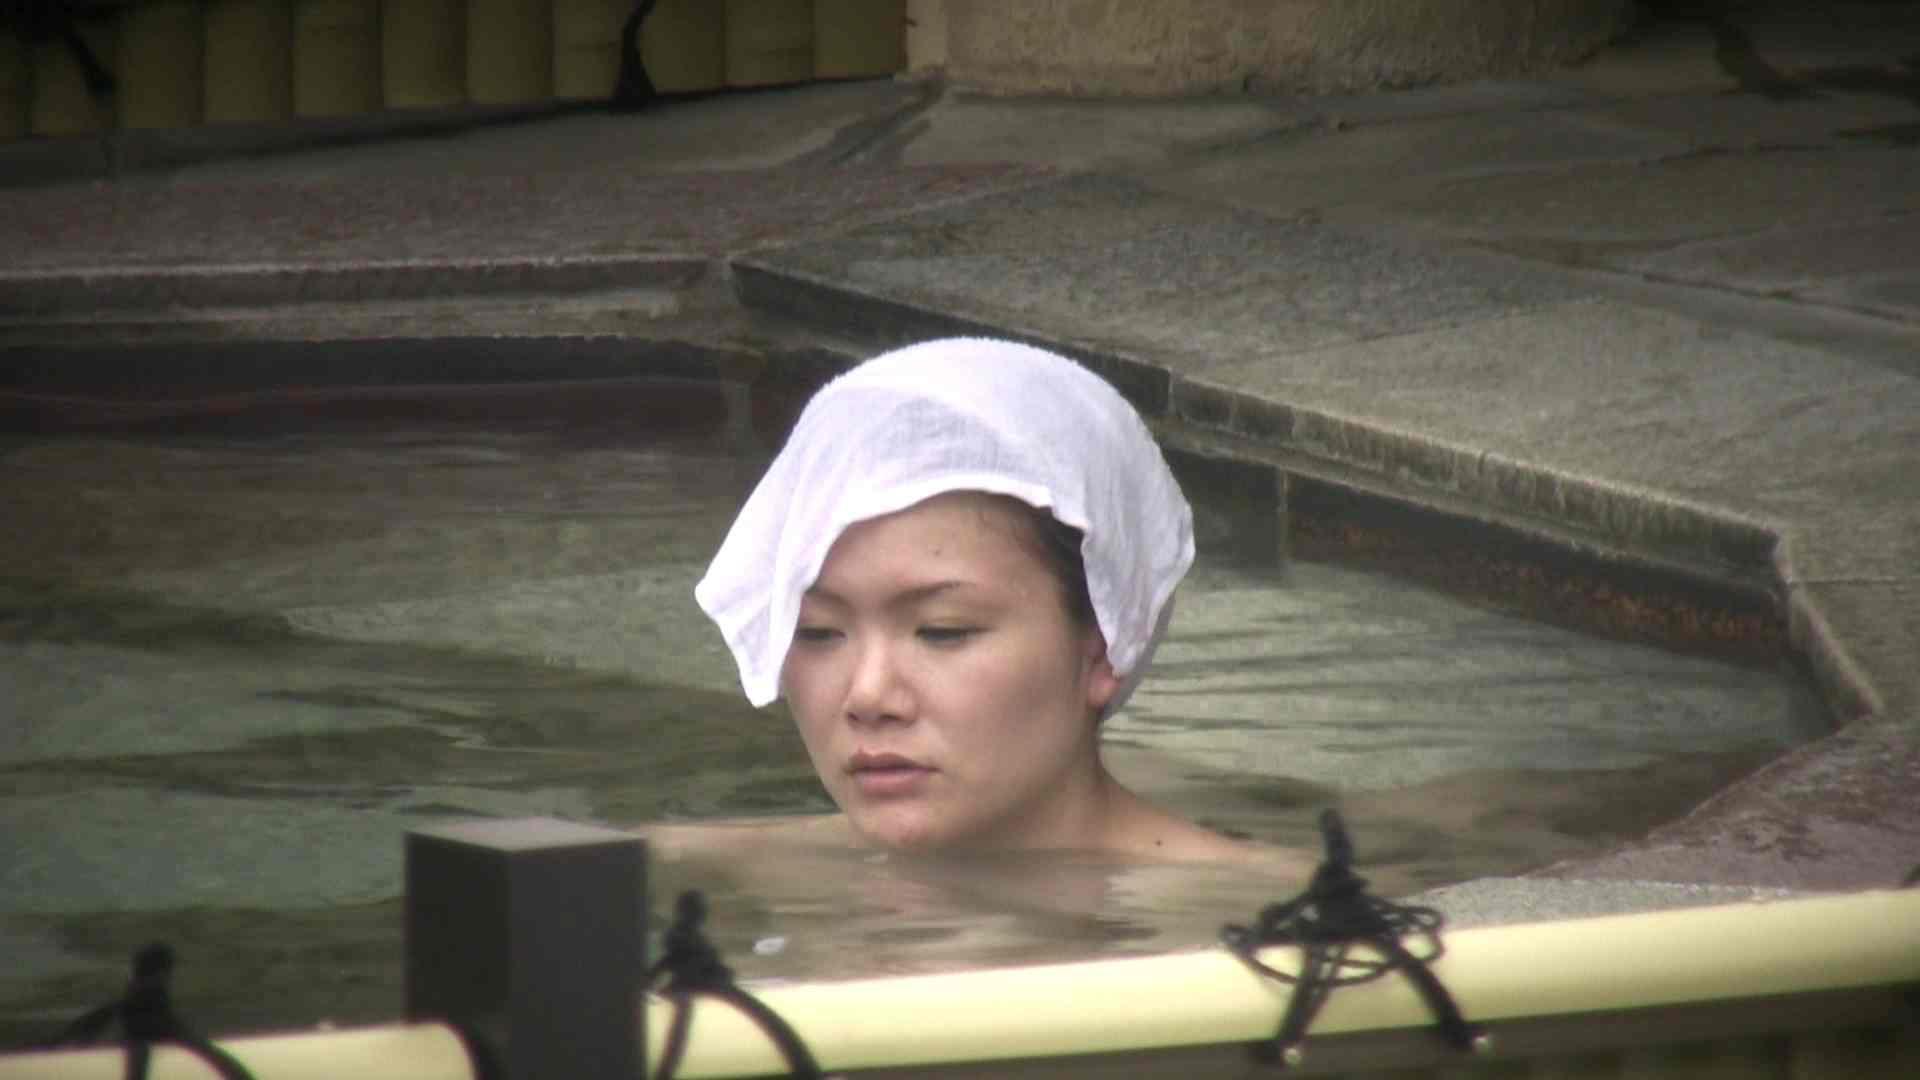 Aquaな露天風呂Vol.12【VIP】 HなOL | 盗撮  83pic 83